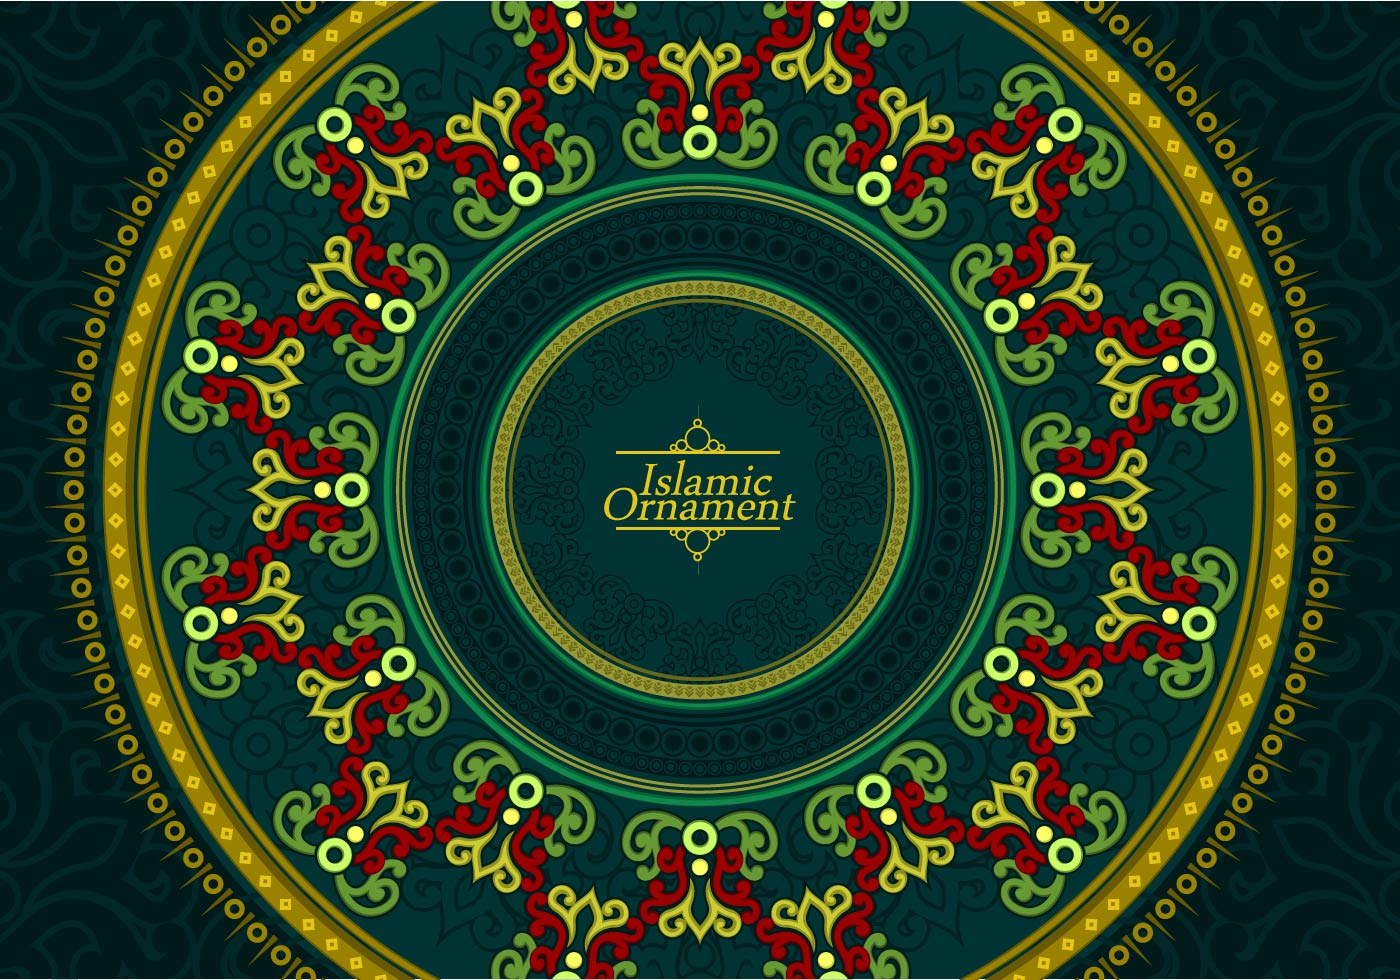 Islamic Ornament Free Vector Download Free Vector Art